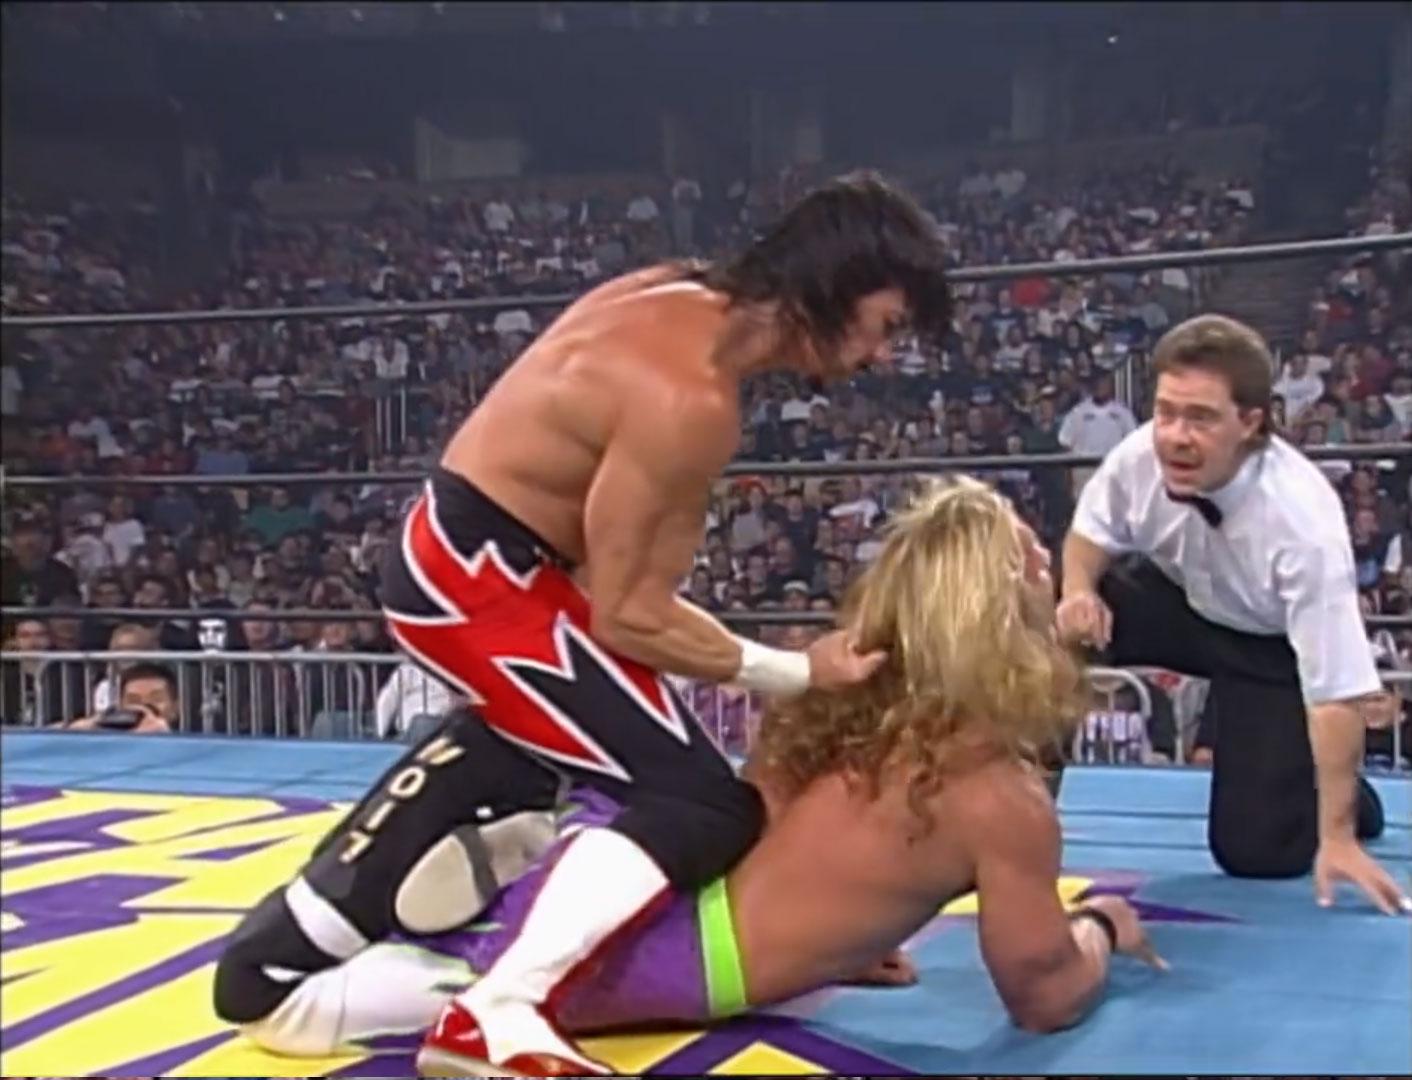 Eddy Guerrero vs. Chris Jericho  WCW Fall Brawl '97, WCW Cruiserweight Championship Sep 14th 1997